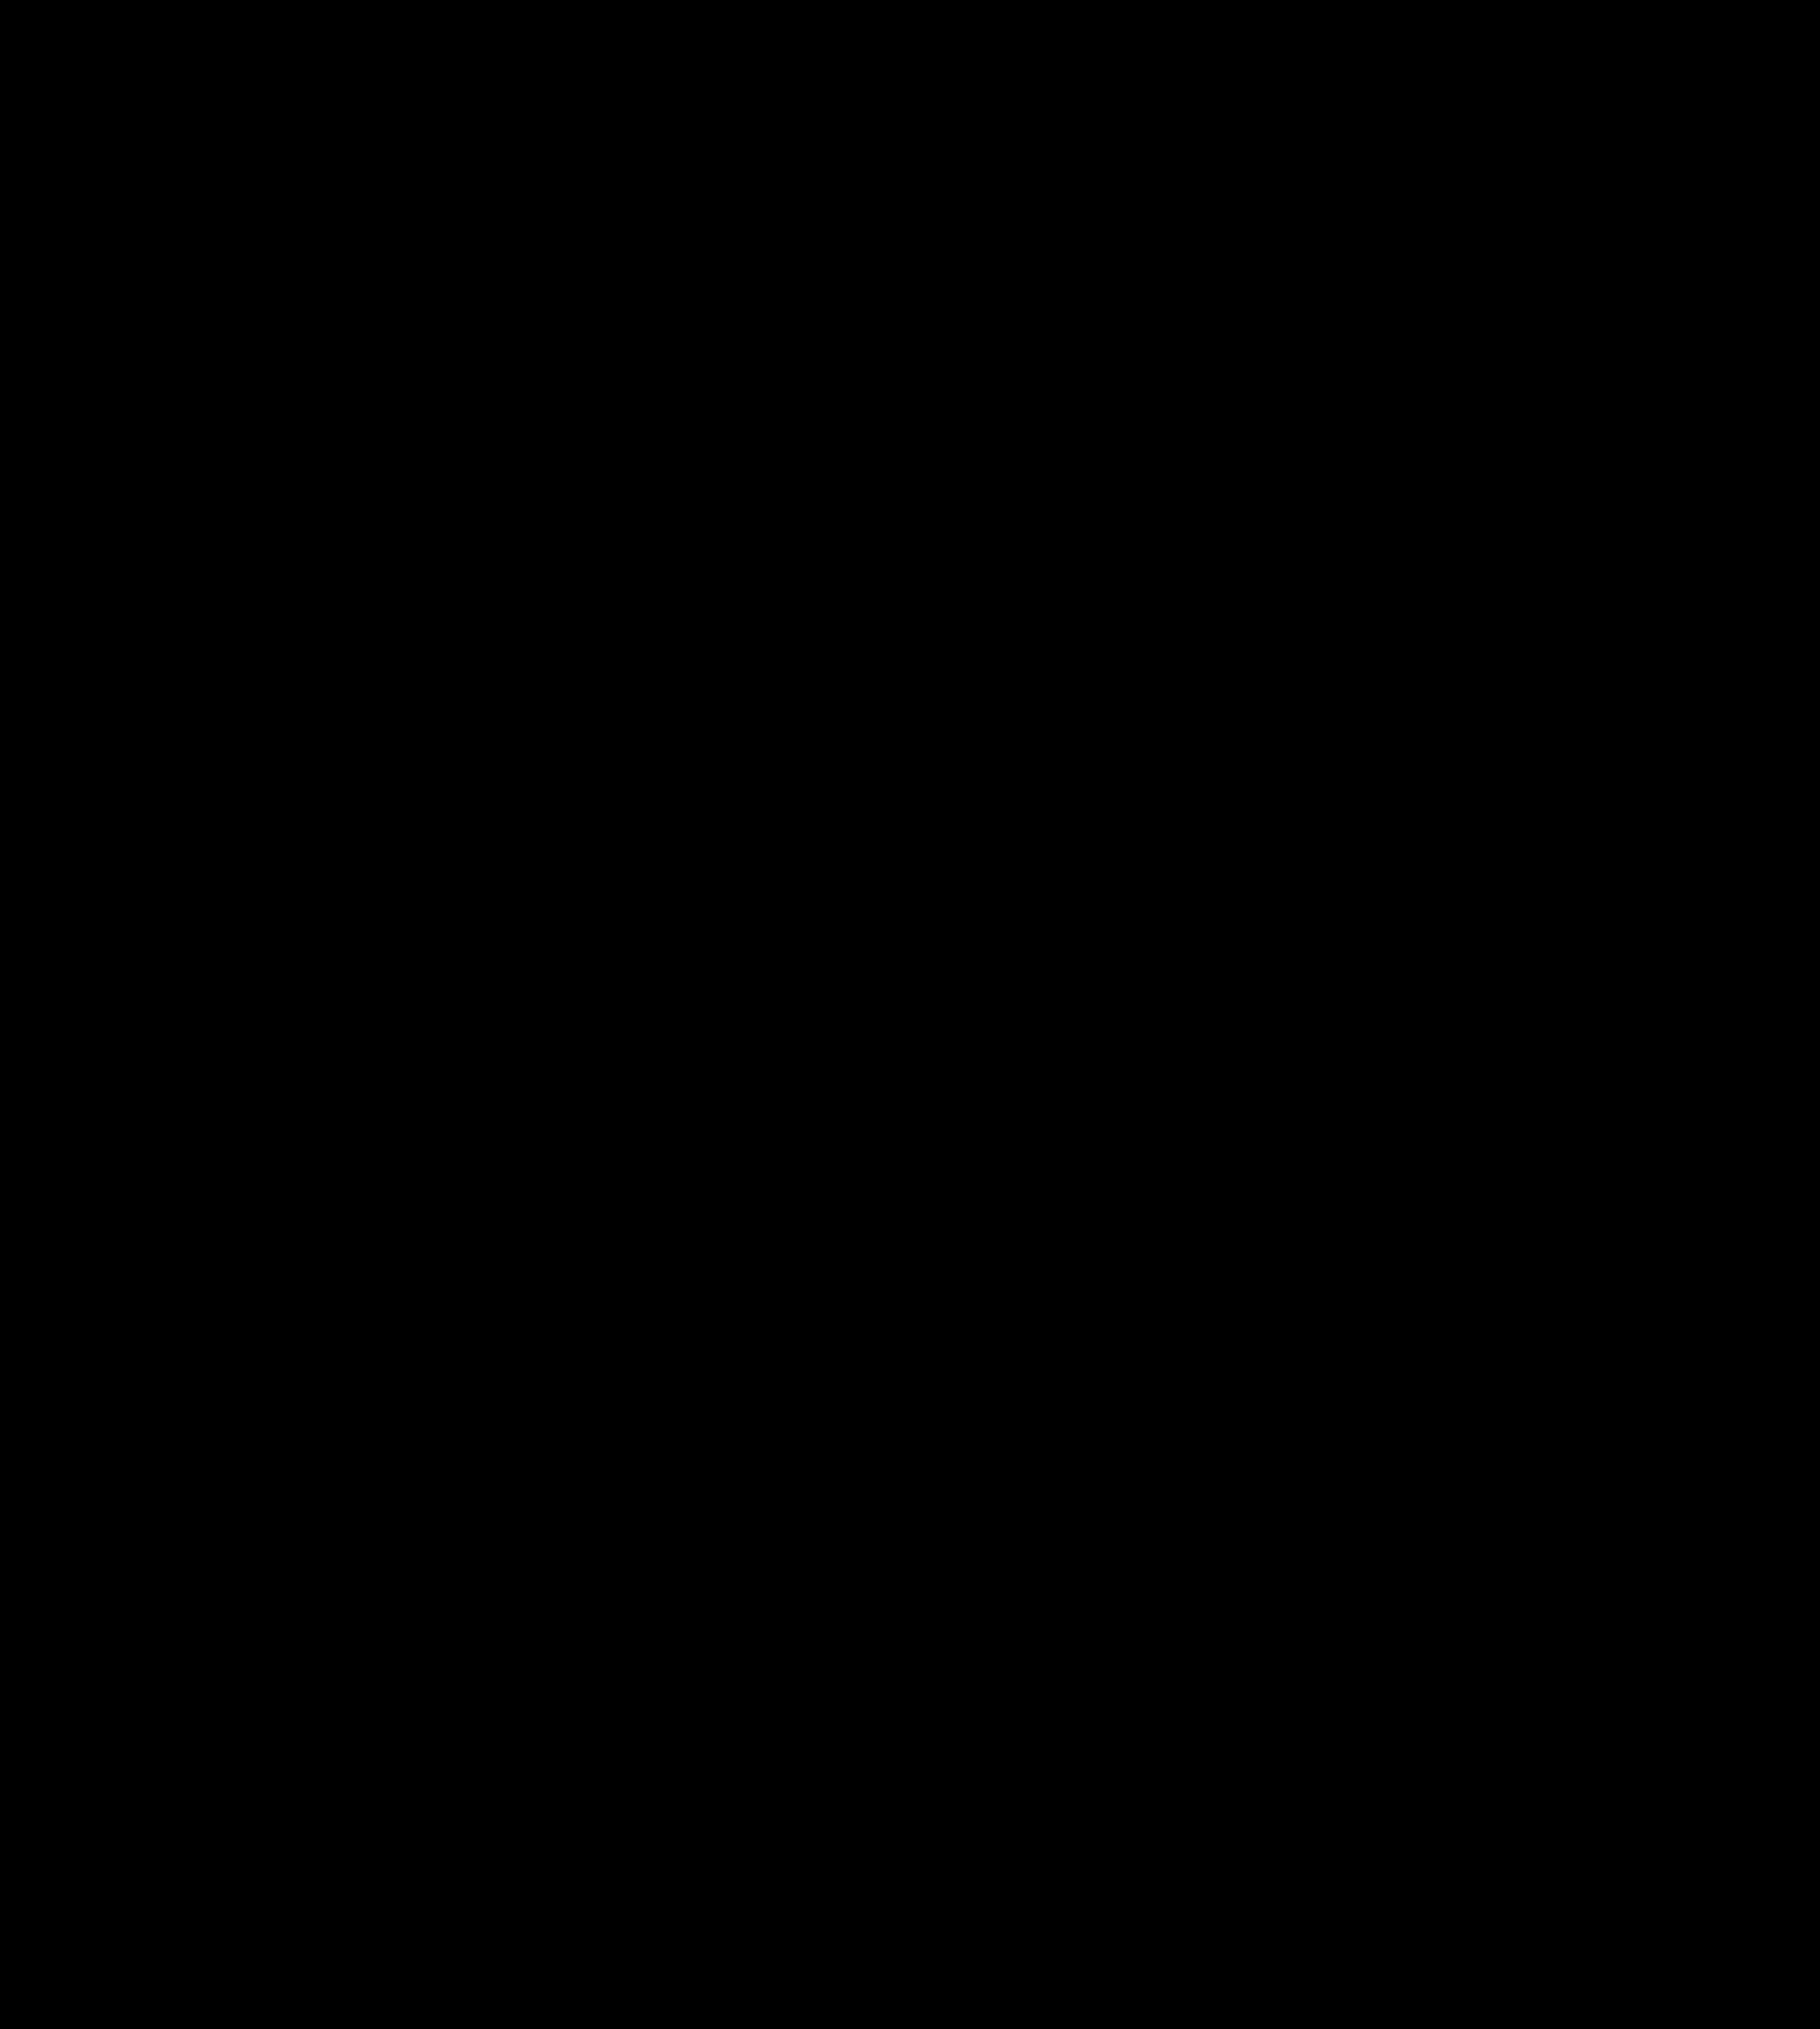 2153x2400 Event